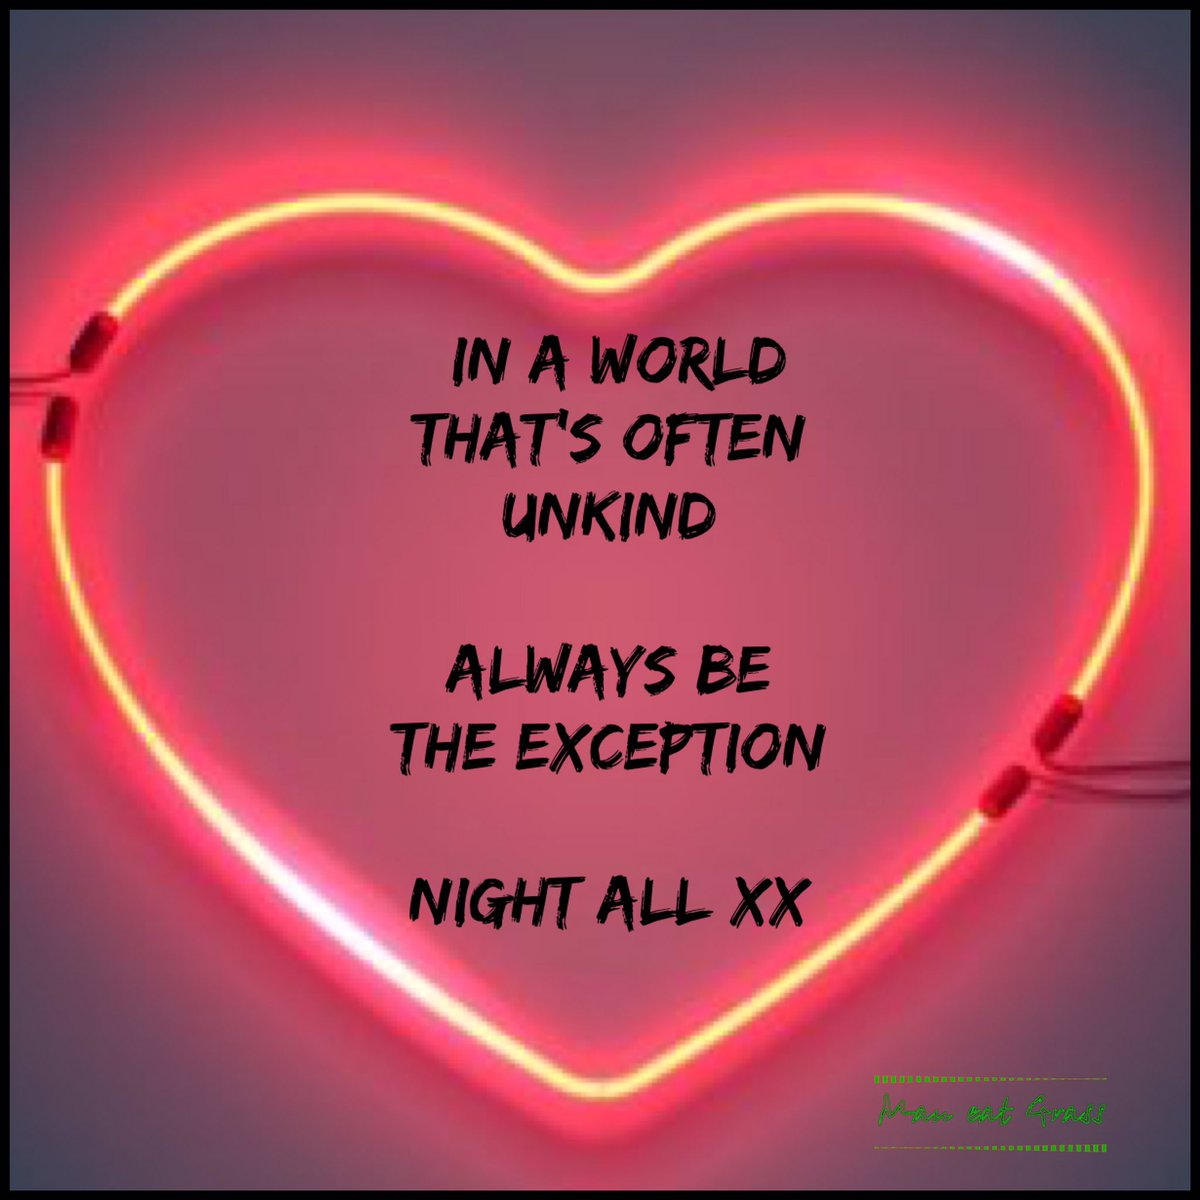 #goodnight #GoodNightEveryone #GoodNightTwitterWorld 😴 take care of one another ... night all xx